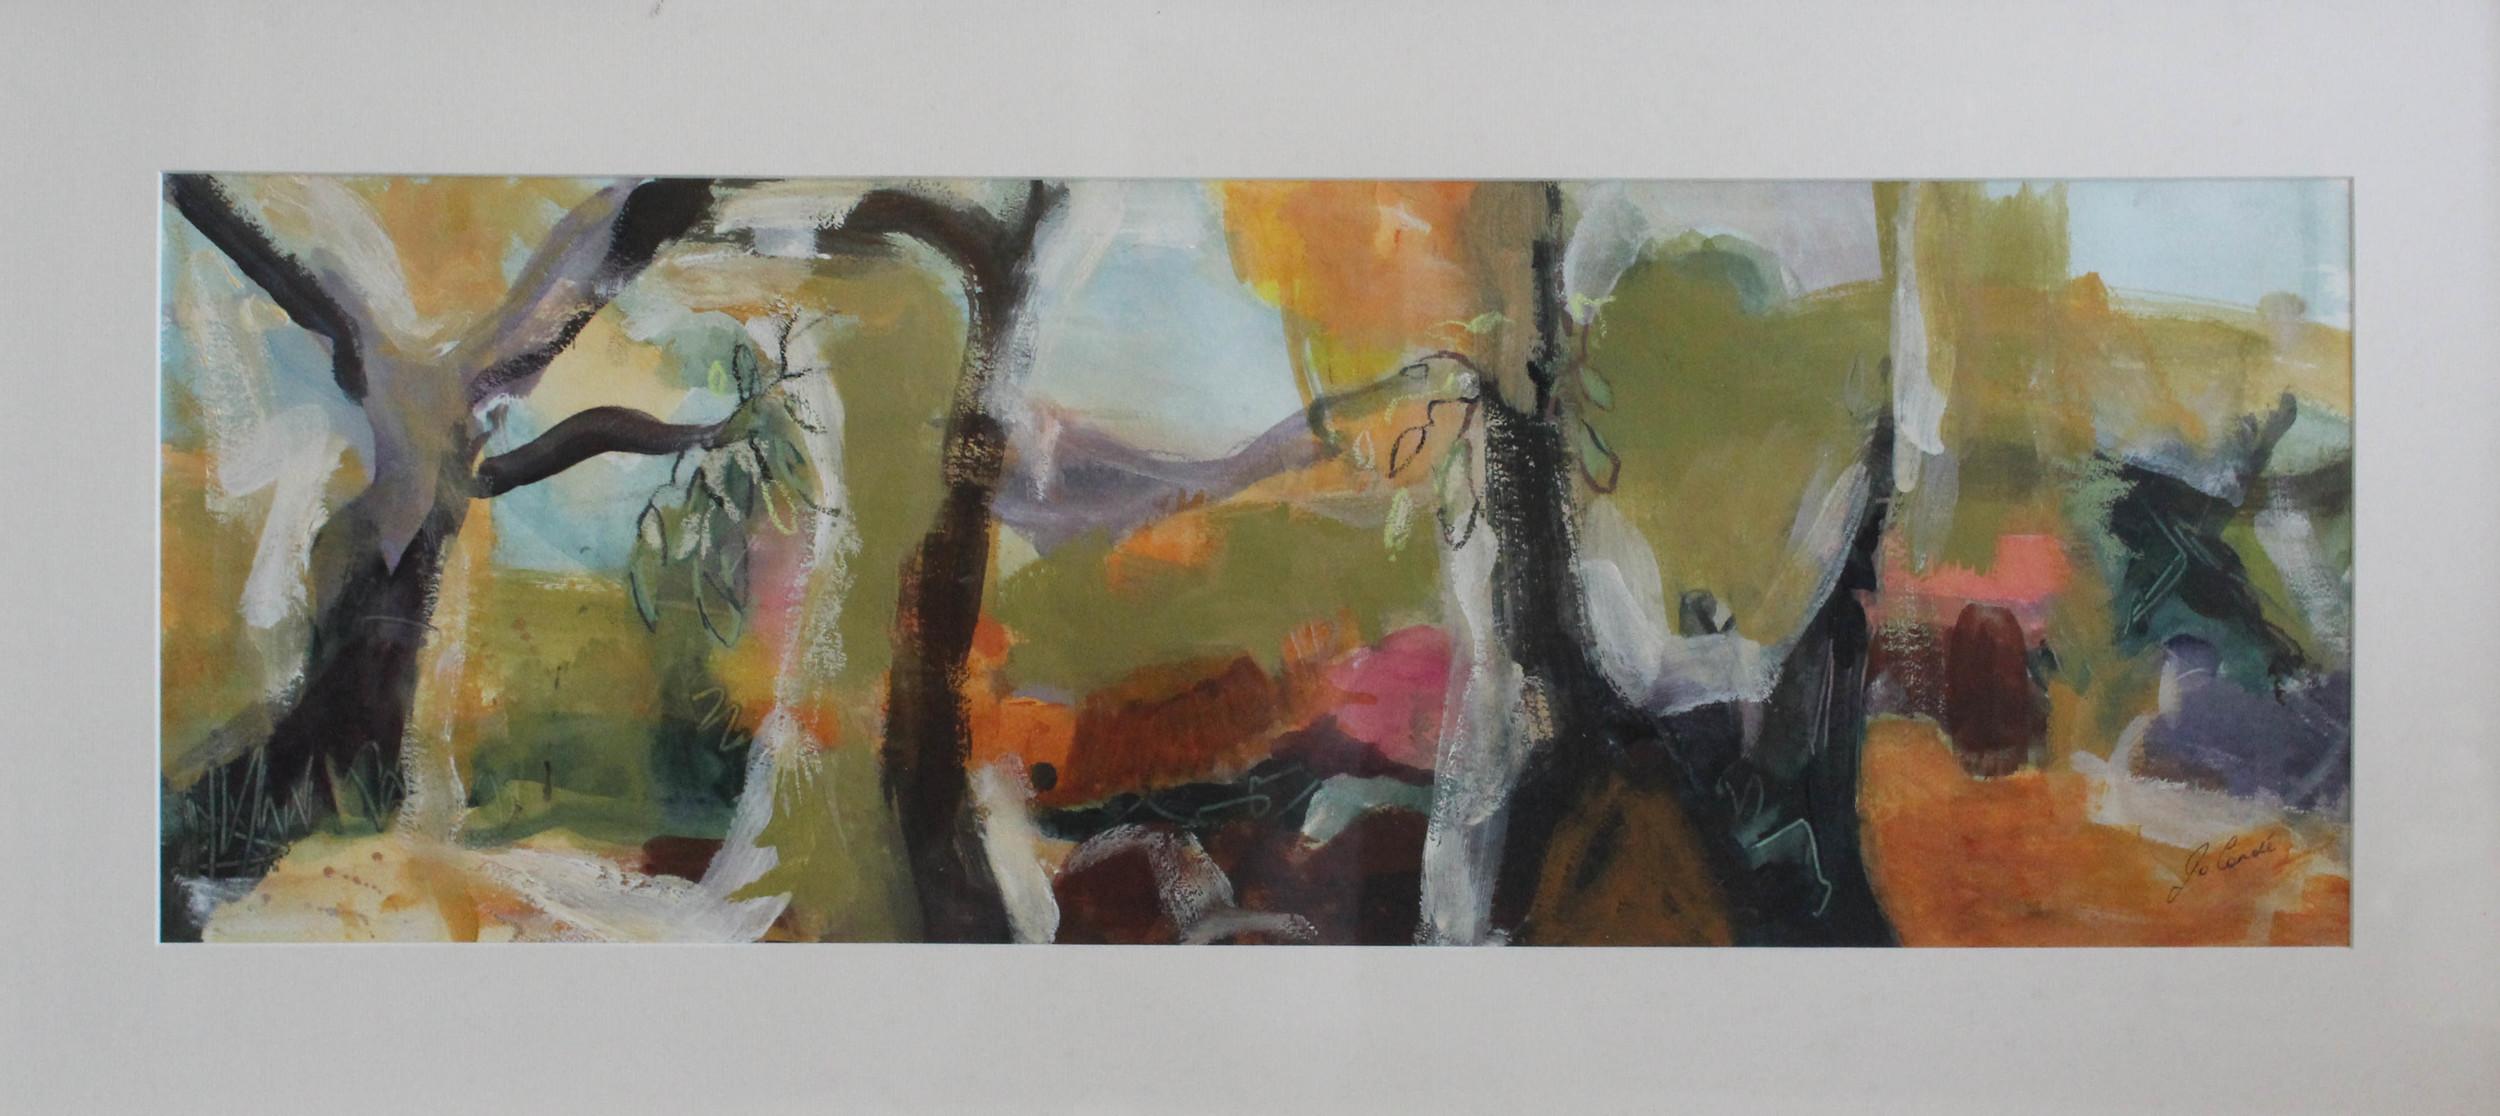 Through the Trees, 930 x 460 mm